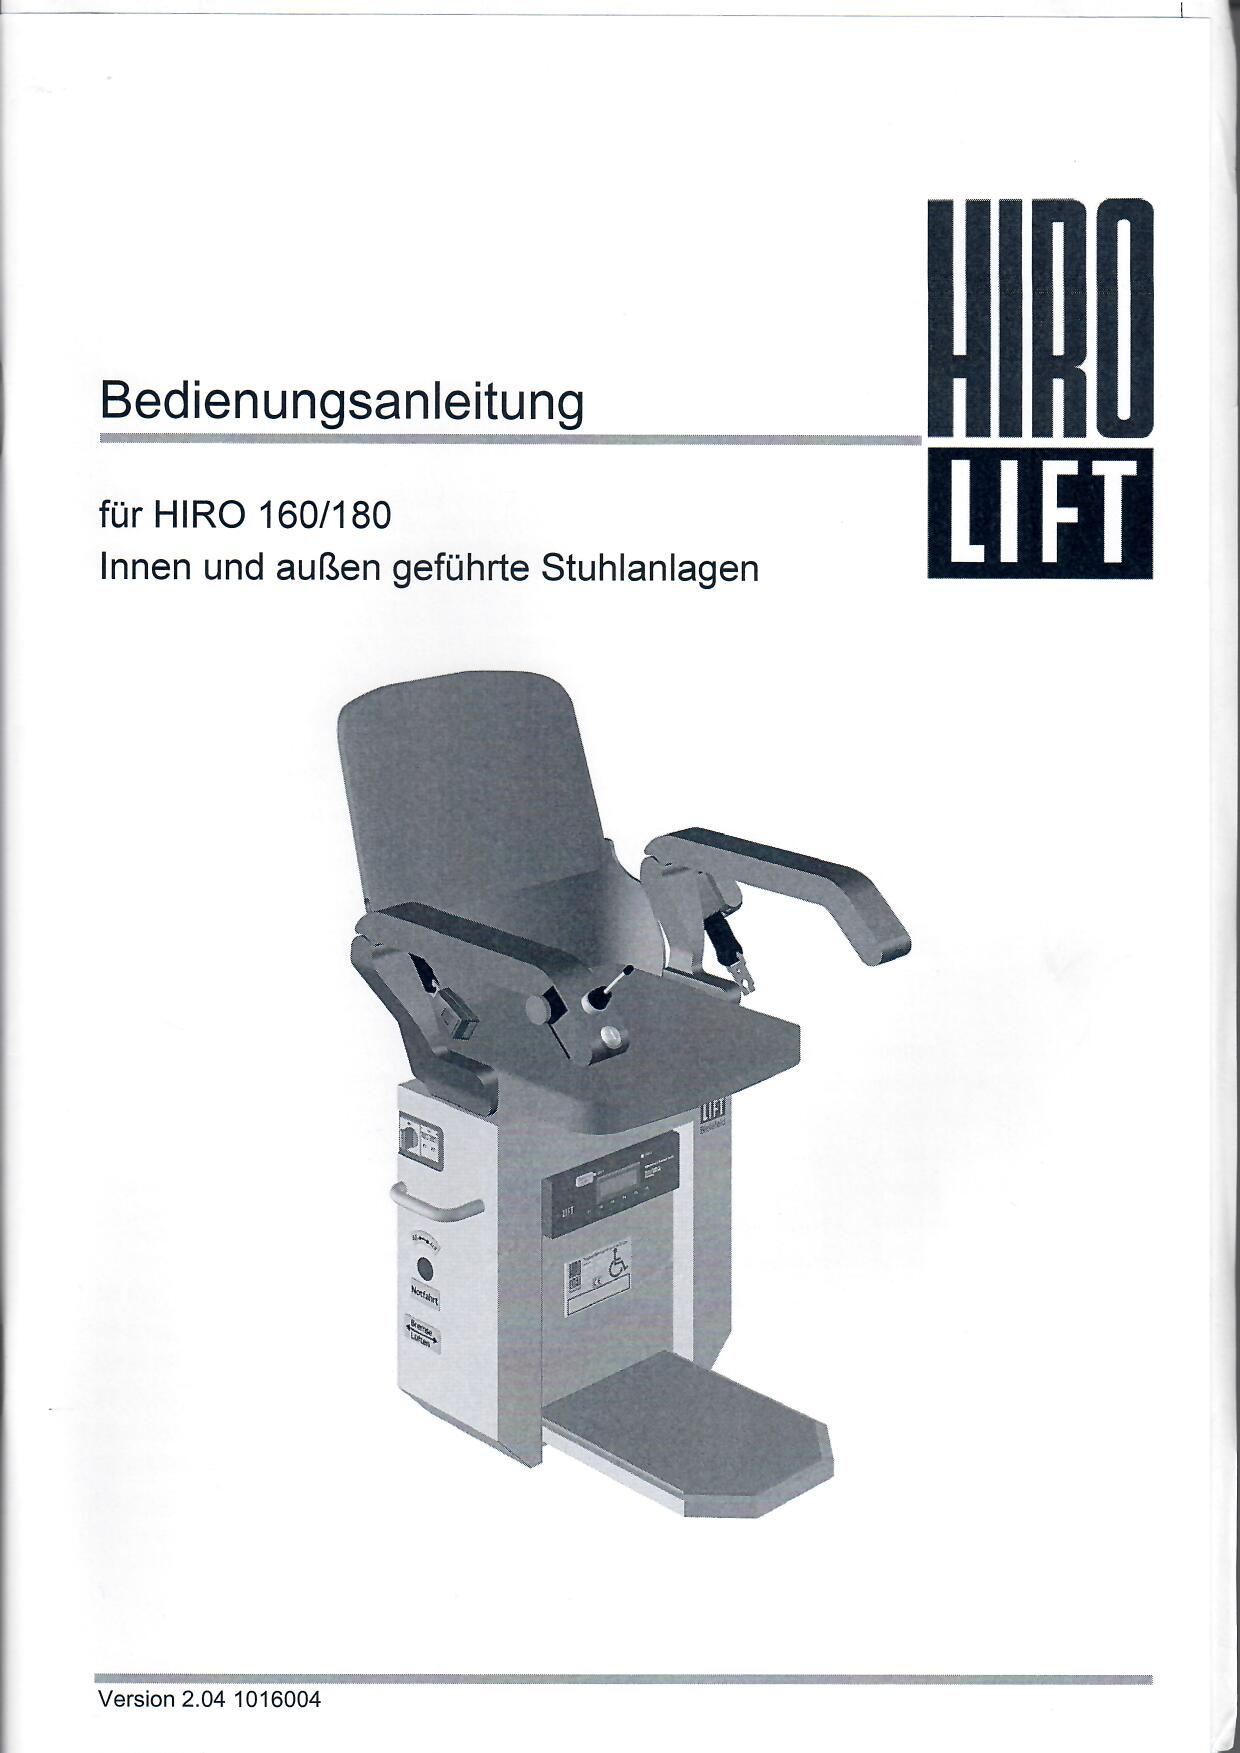 occasion-treppenlift-beimler-treppenlift-bedienungsanleitung.jpg